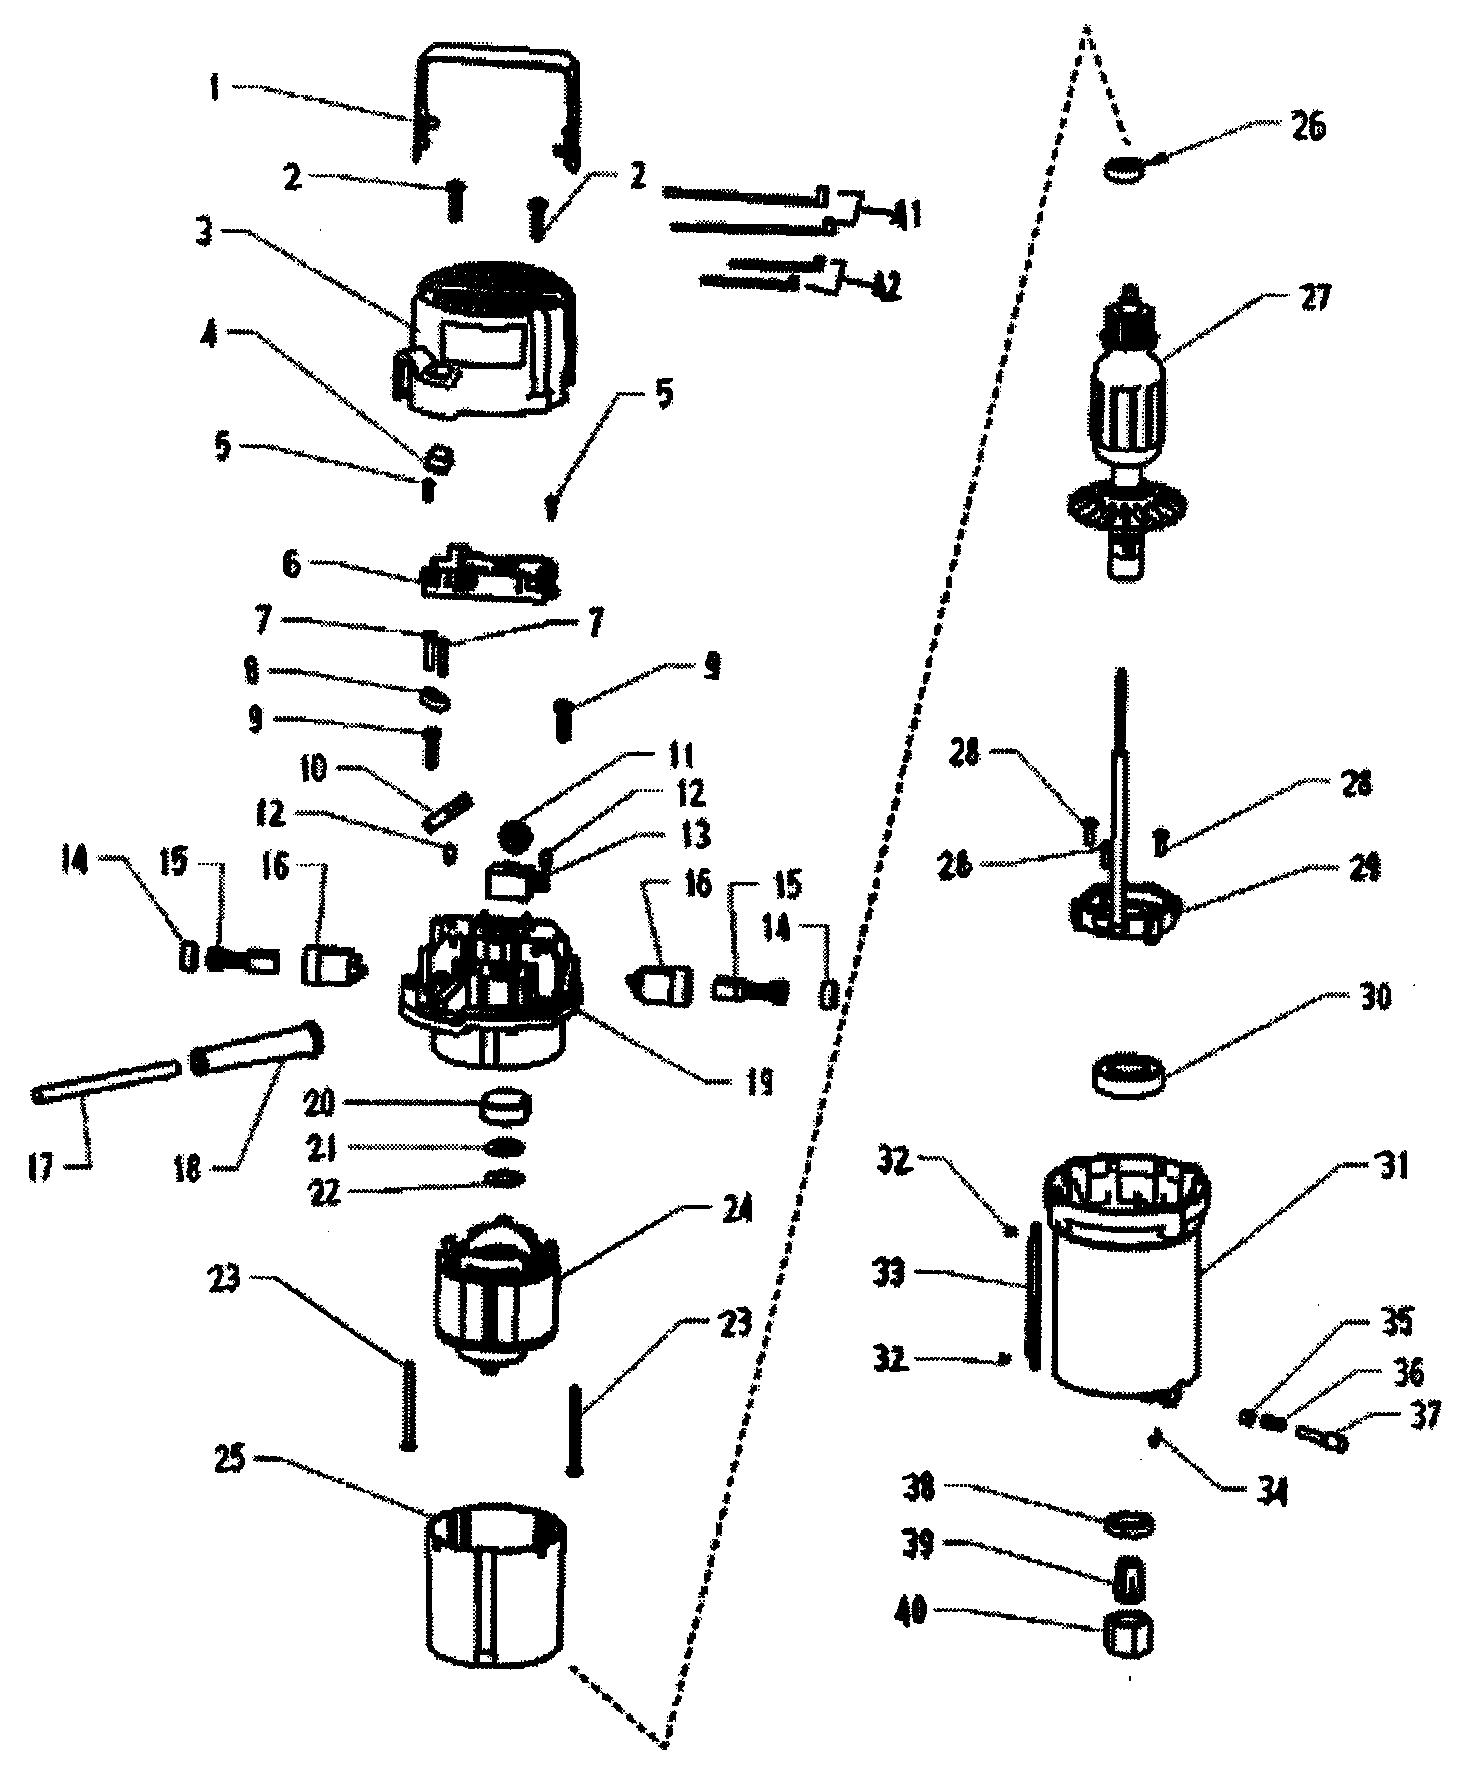 Craftsman model 32017540 router genuine parts